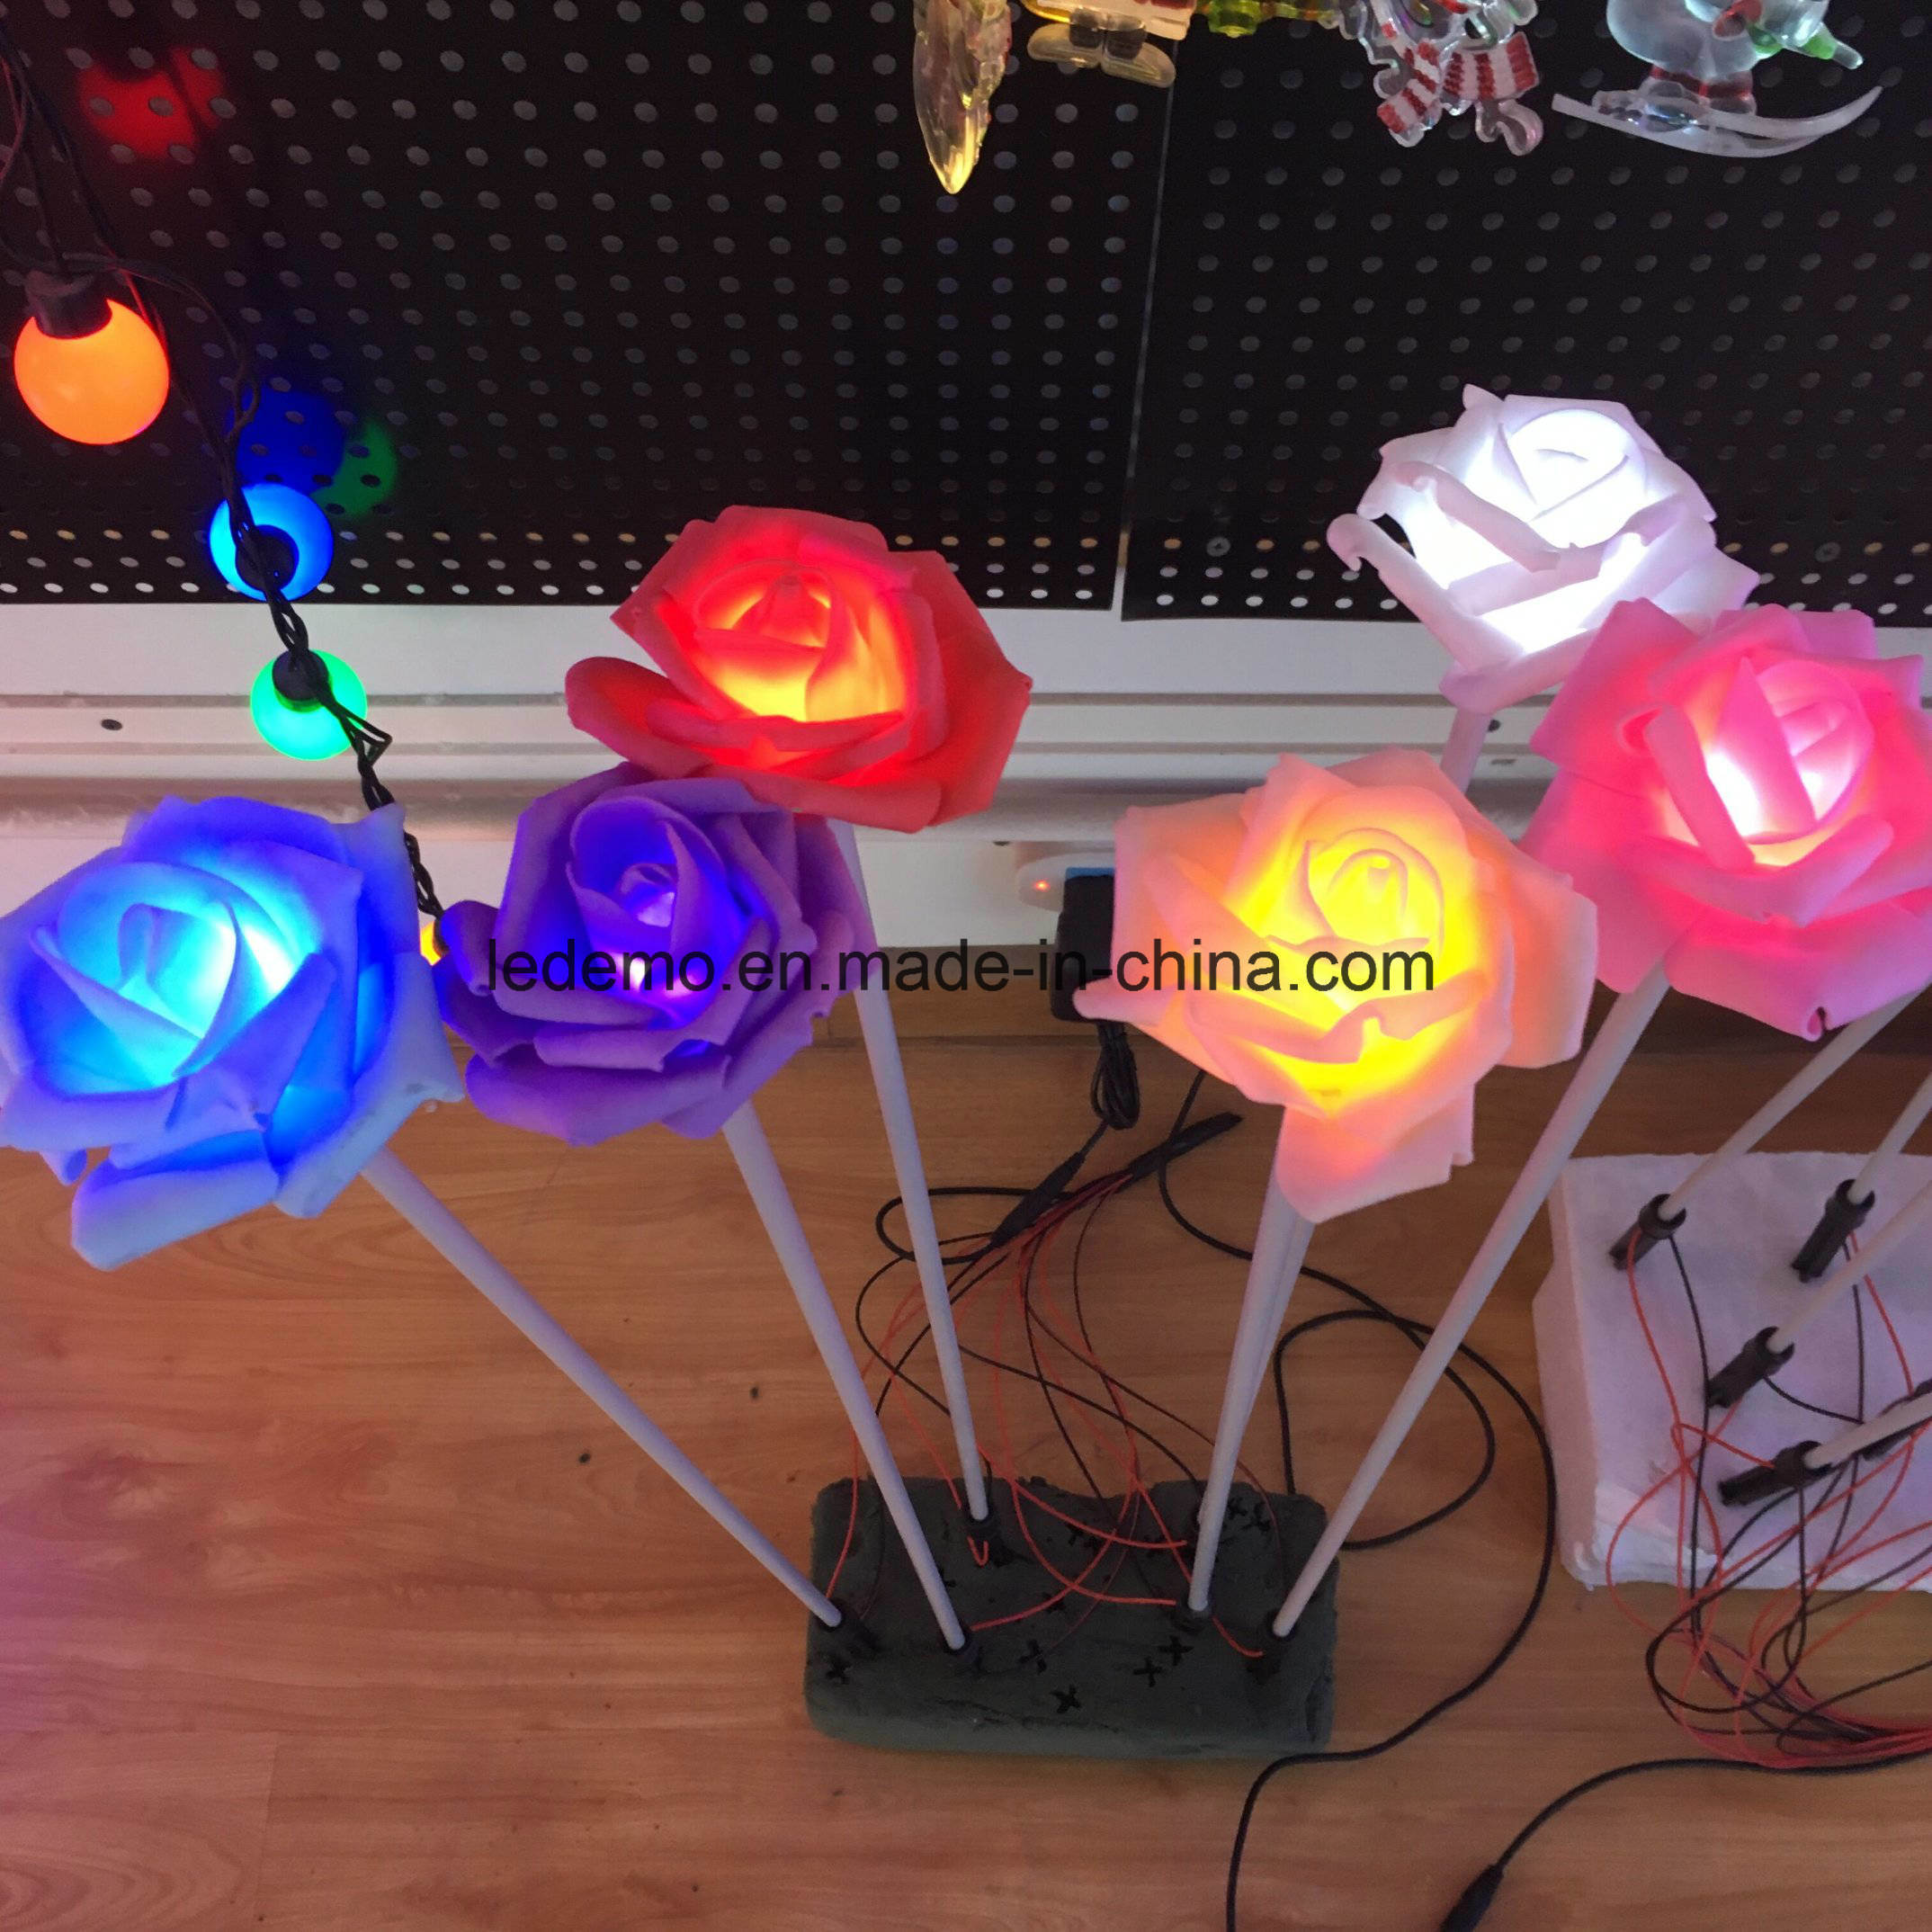 LED Rose Flower Sea Decoration Light